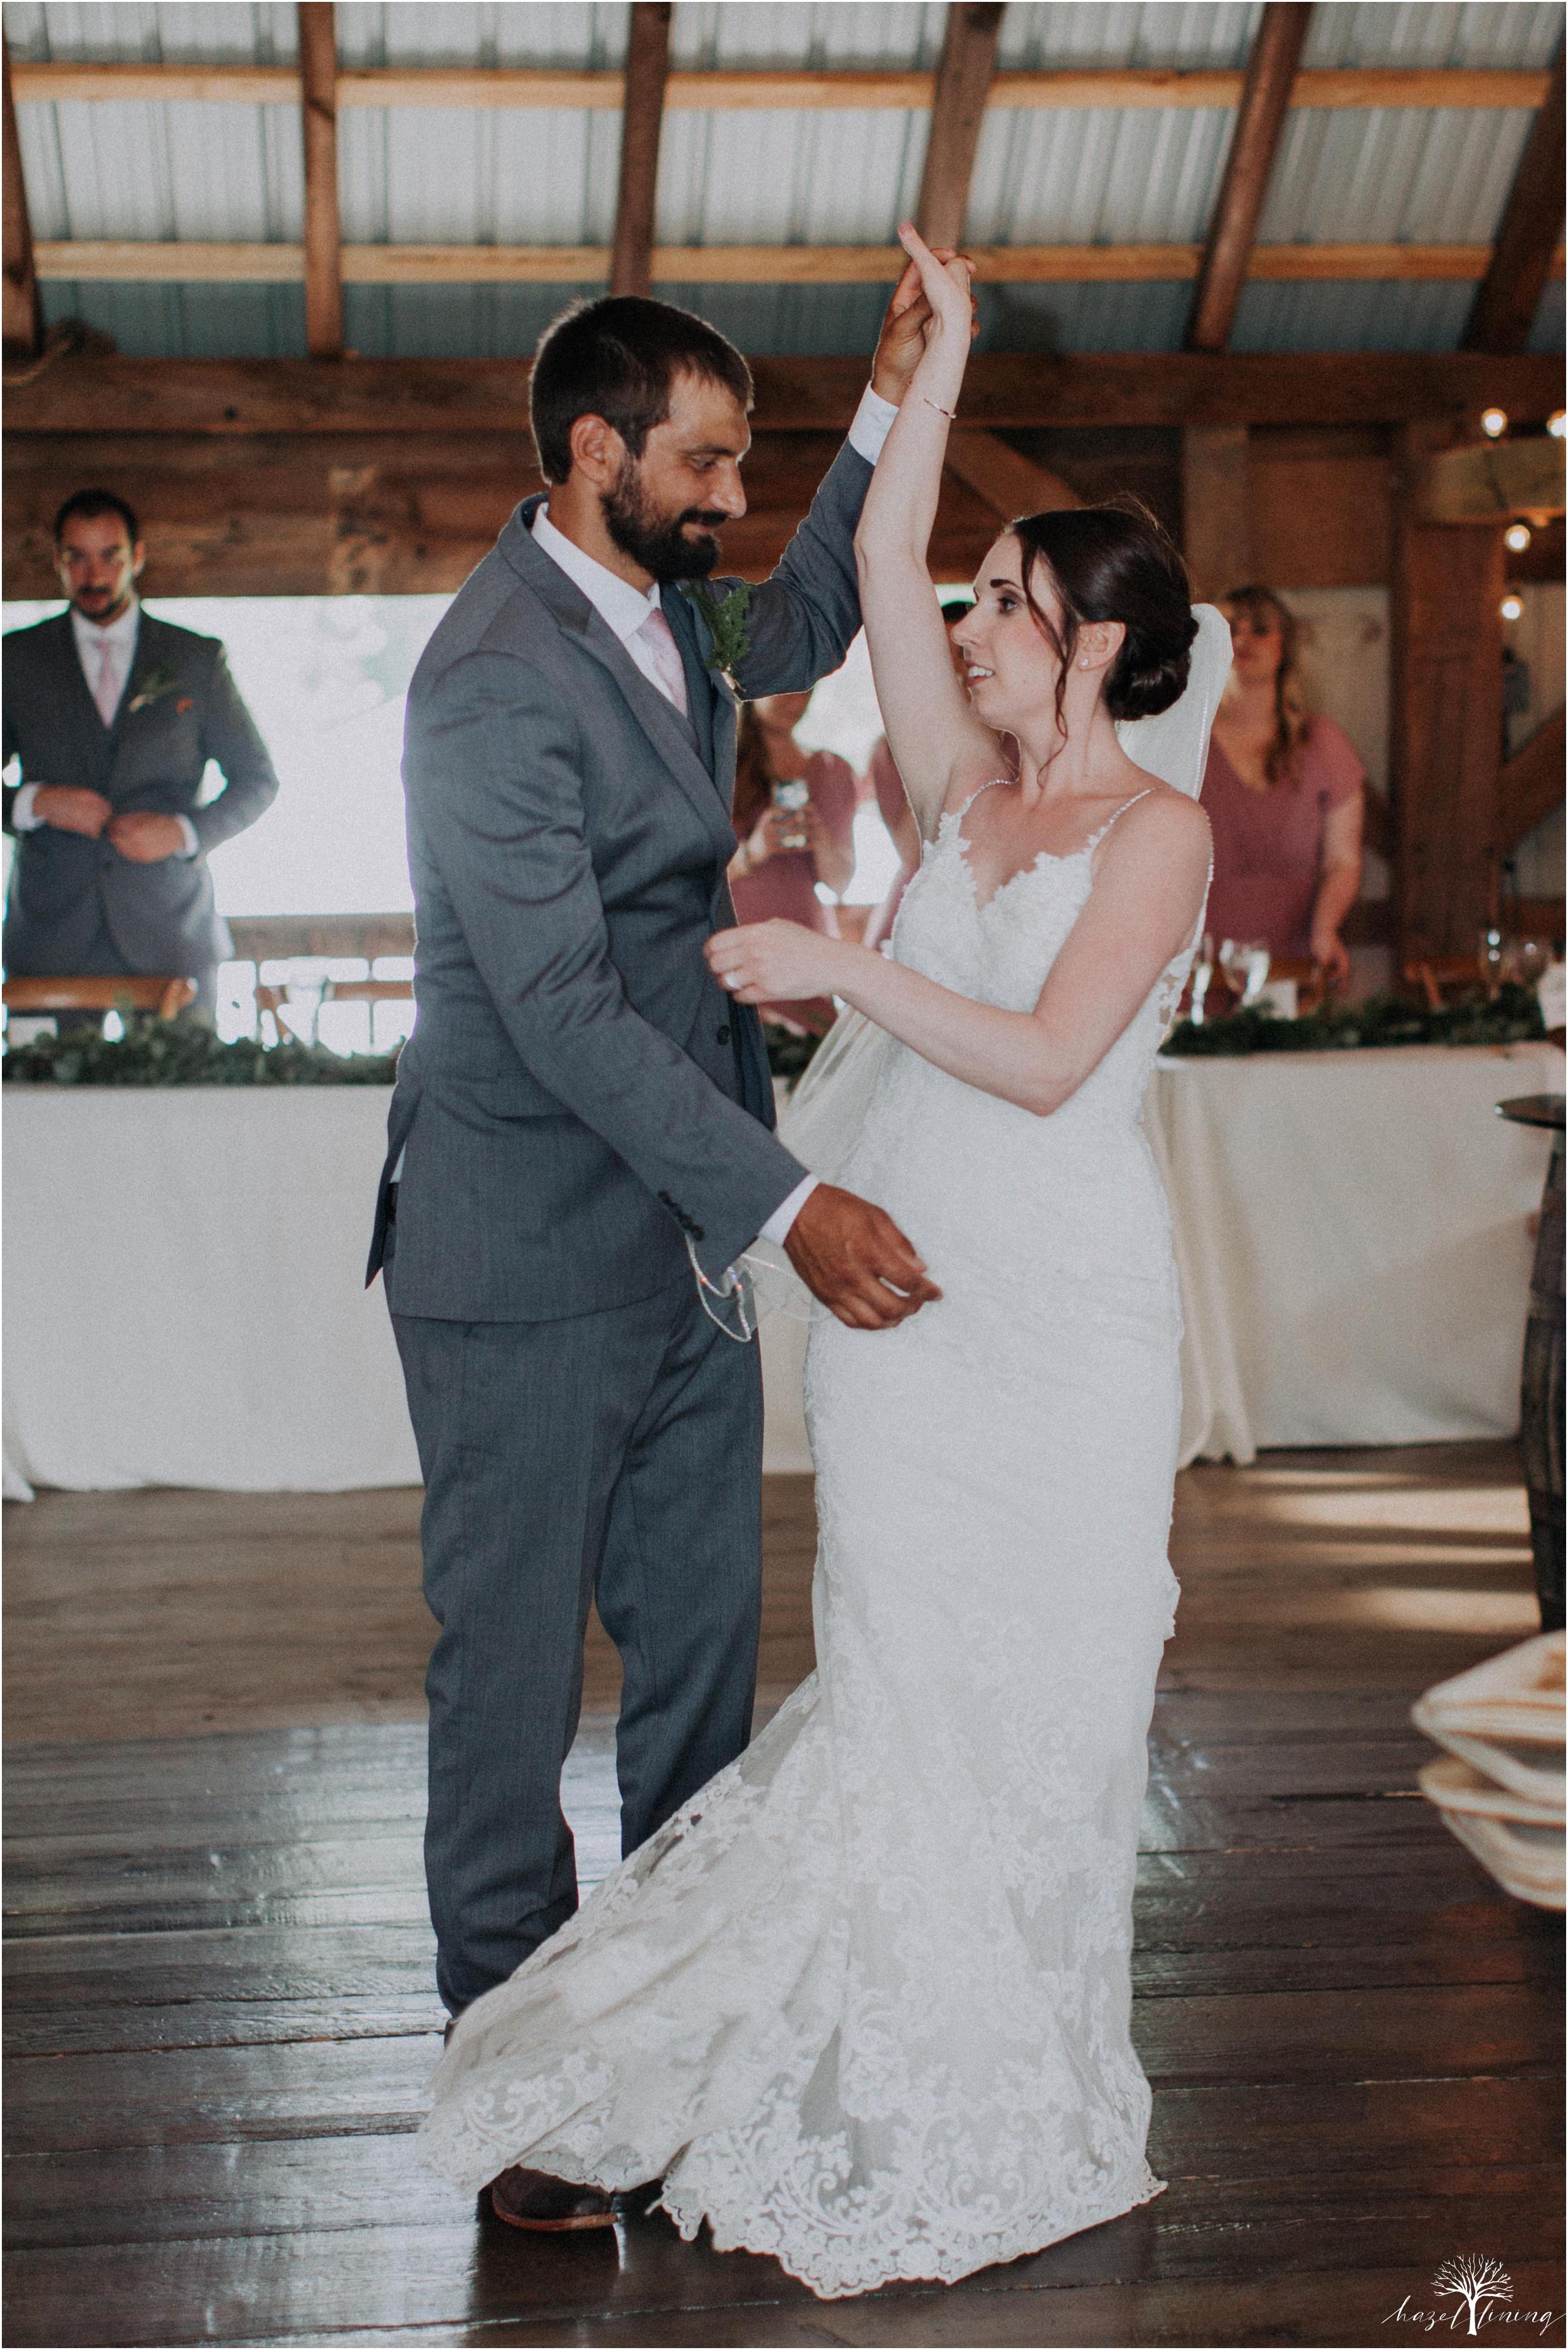 hazel-lining-travel-wedding-elopement-photography-lisa-landon-shoemaker-the-farm-bakery-and-events-bucks-county-quakertown-pennsylvania-summer-country-outdoor-farm-wedding_0114.jpg